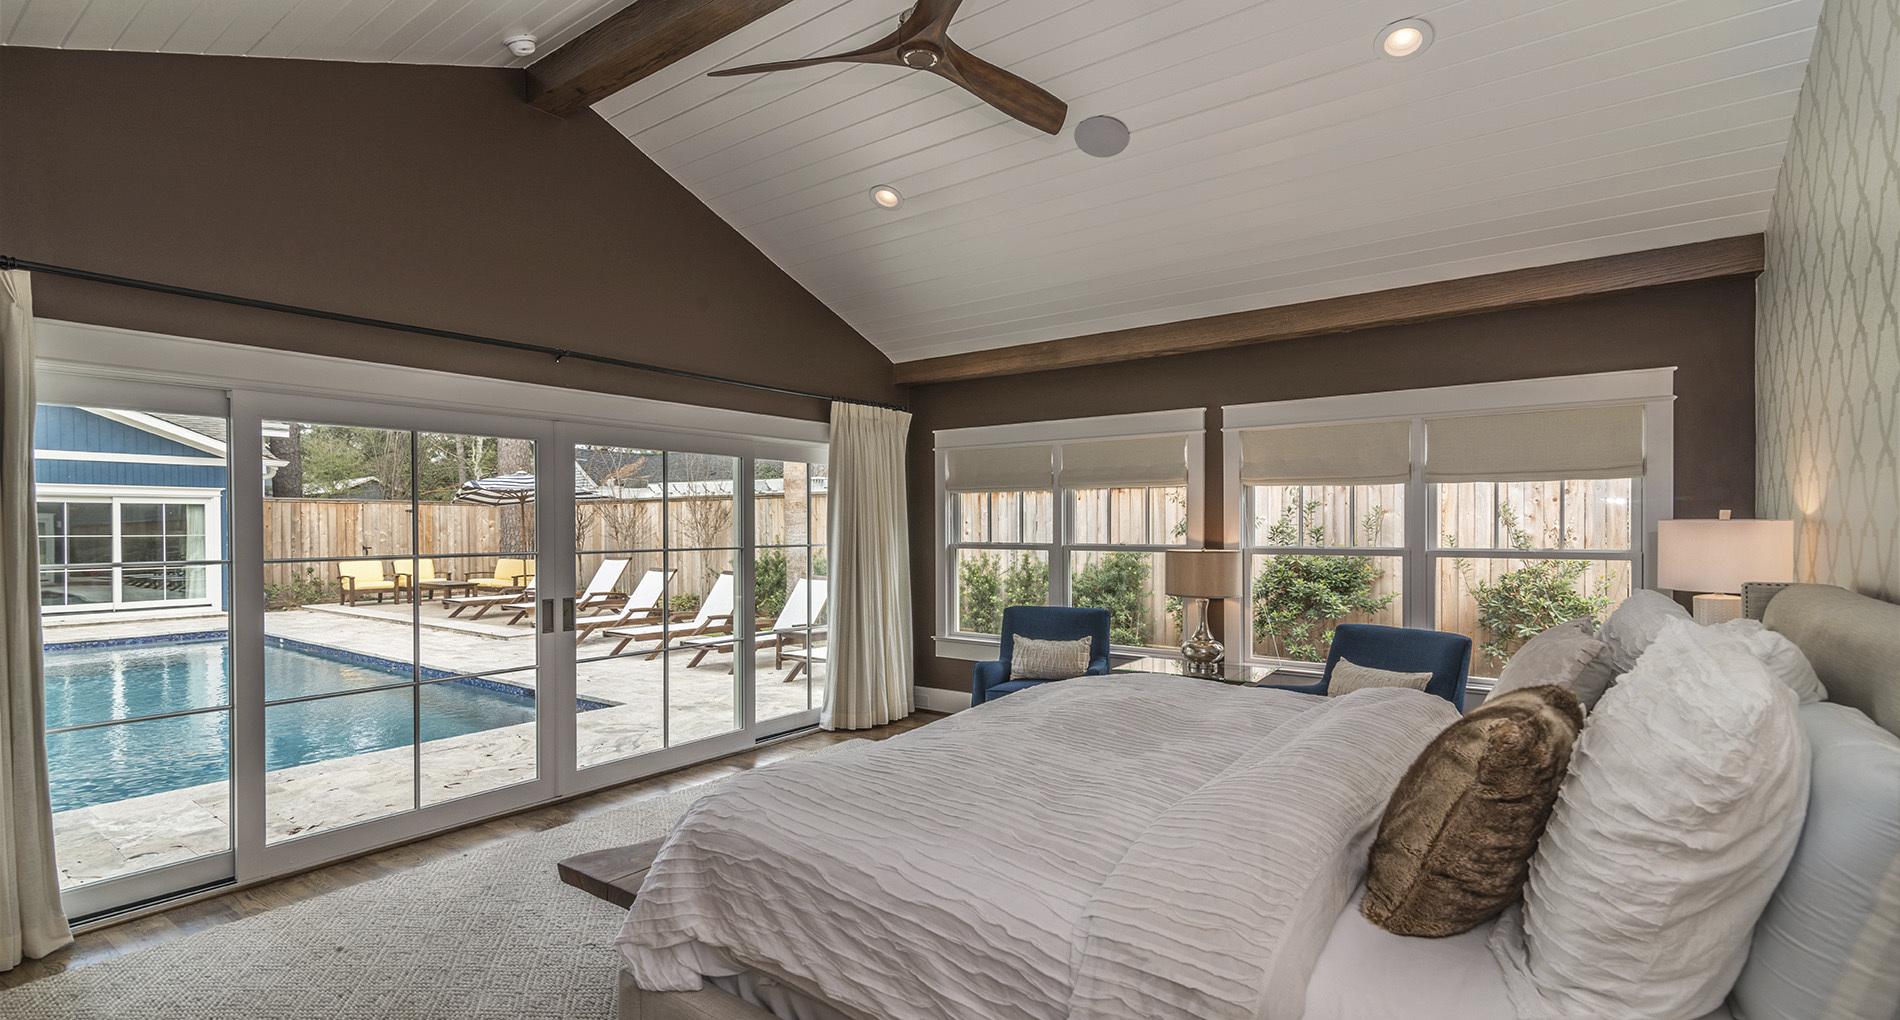 bedroom with floor to ceiling windows overlooking pool